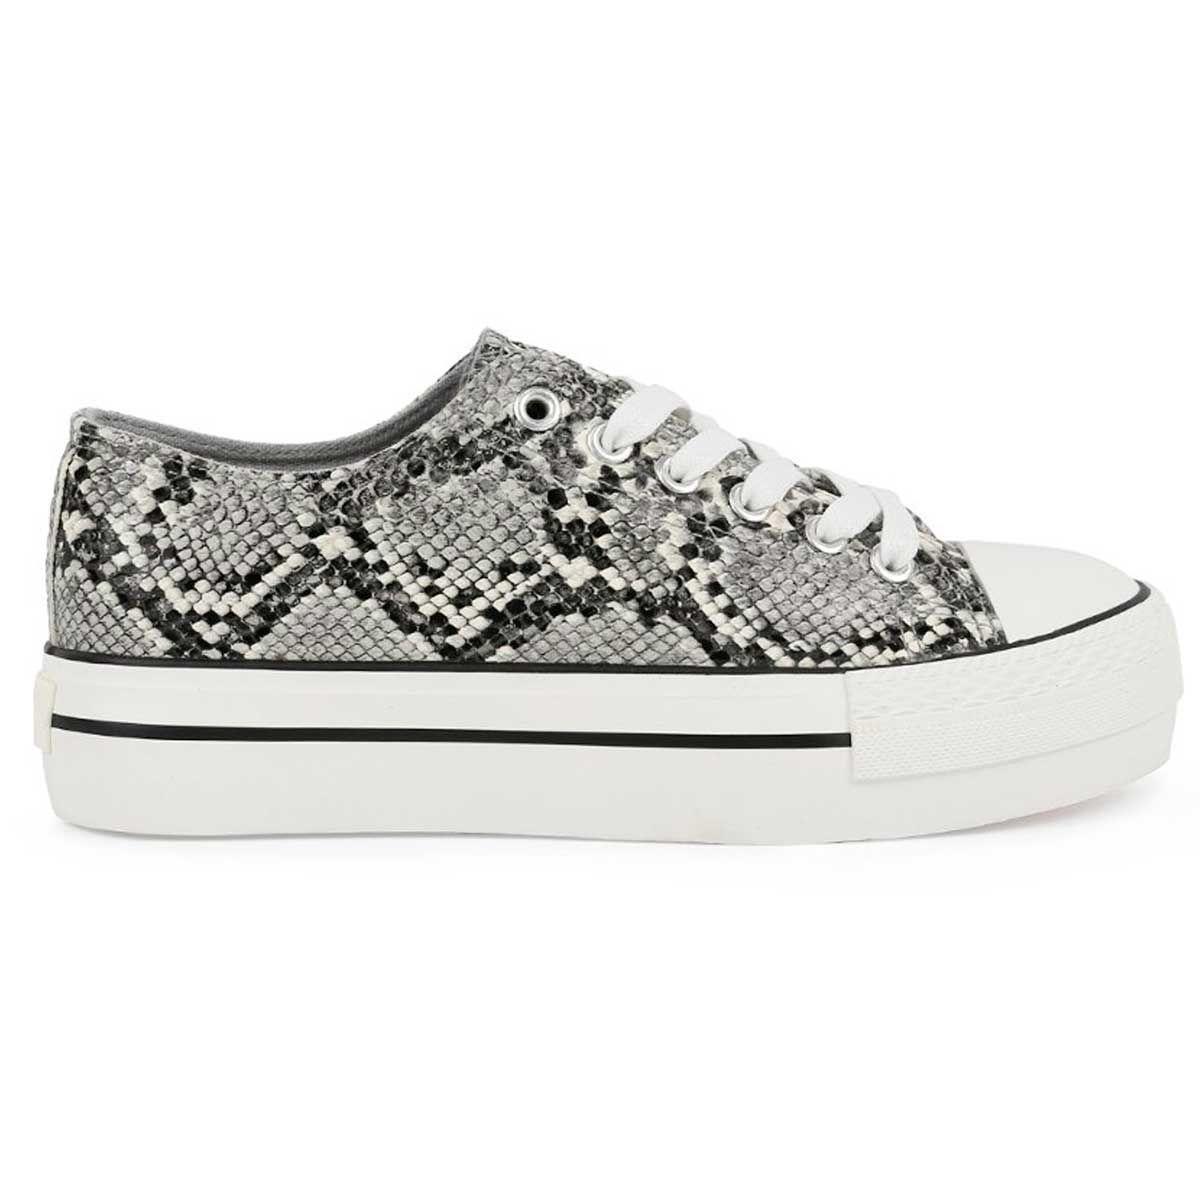 Montevita Lace Up Sneaker in Grey Snake